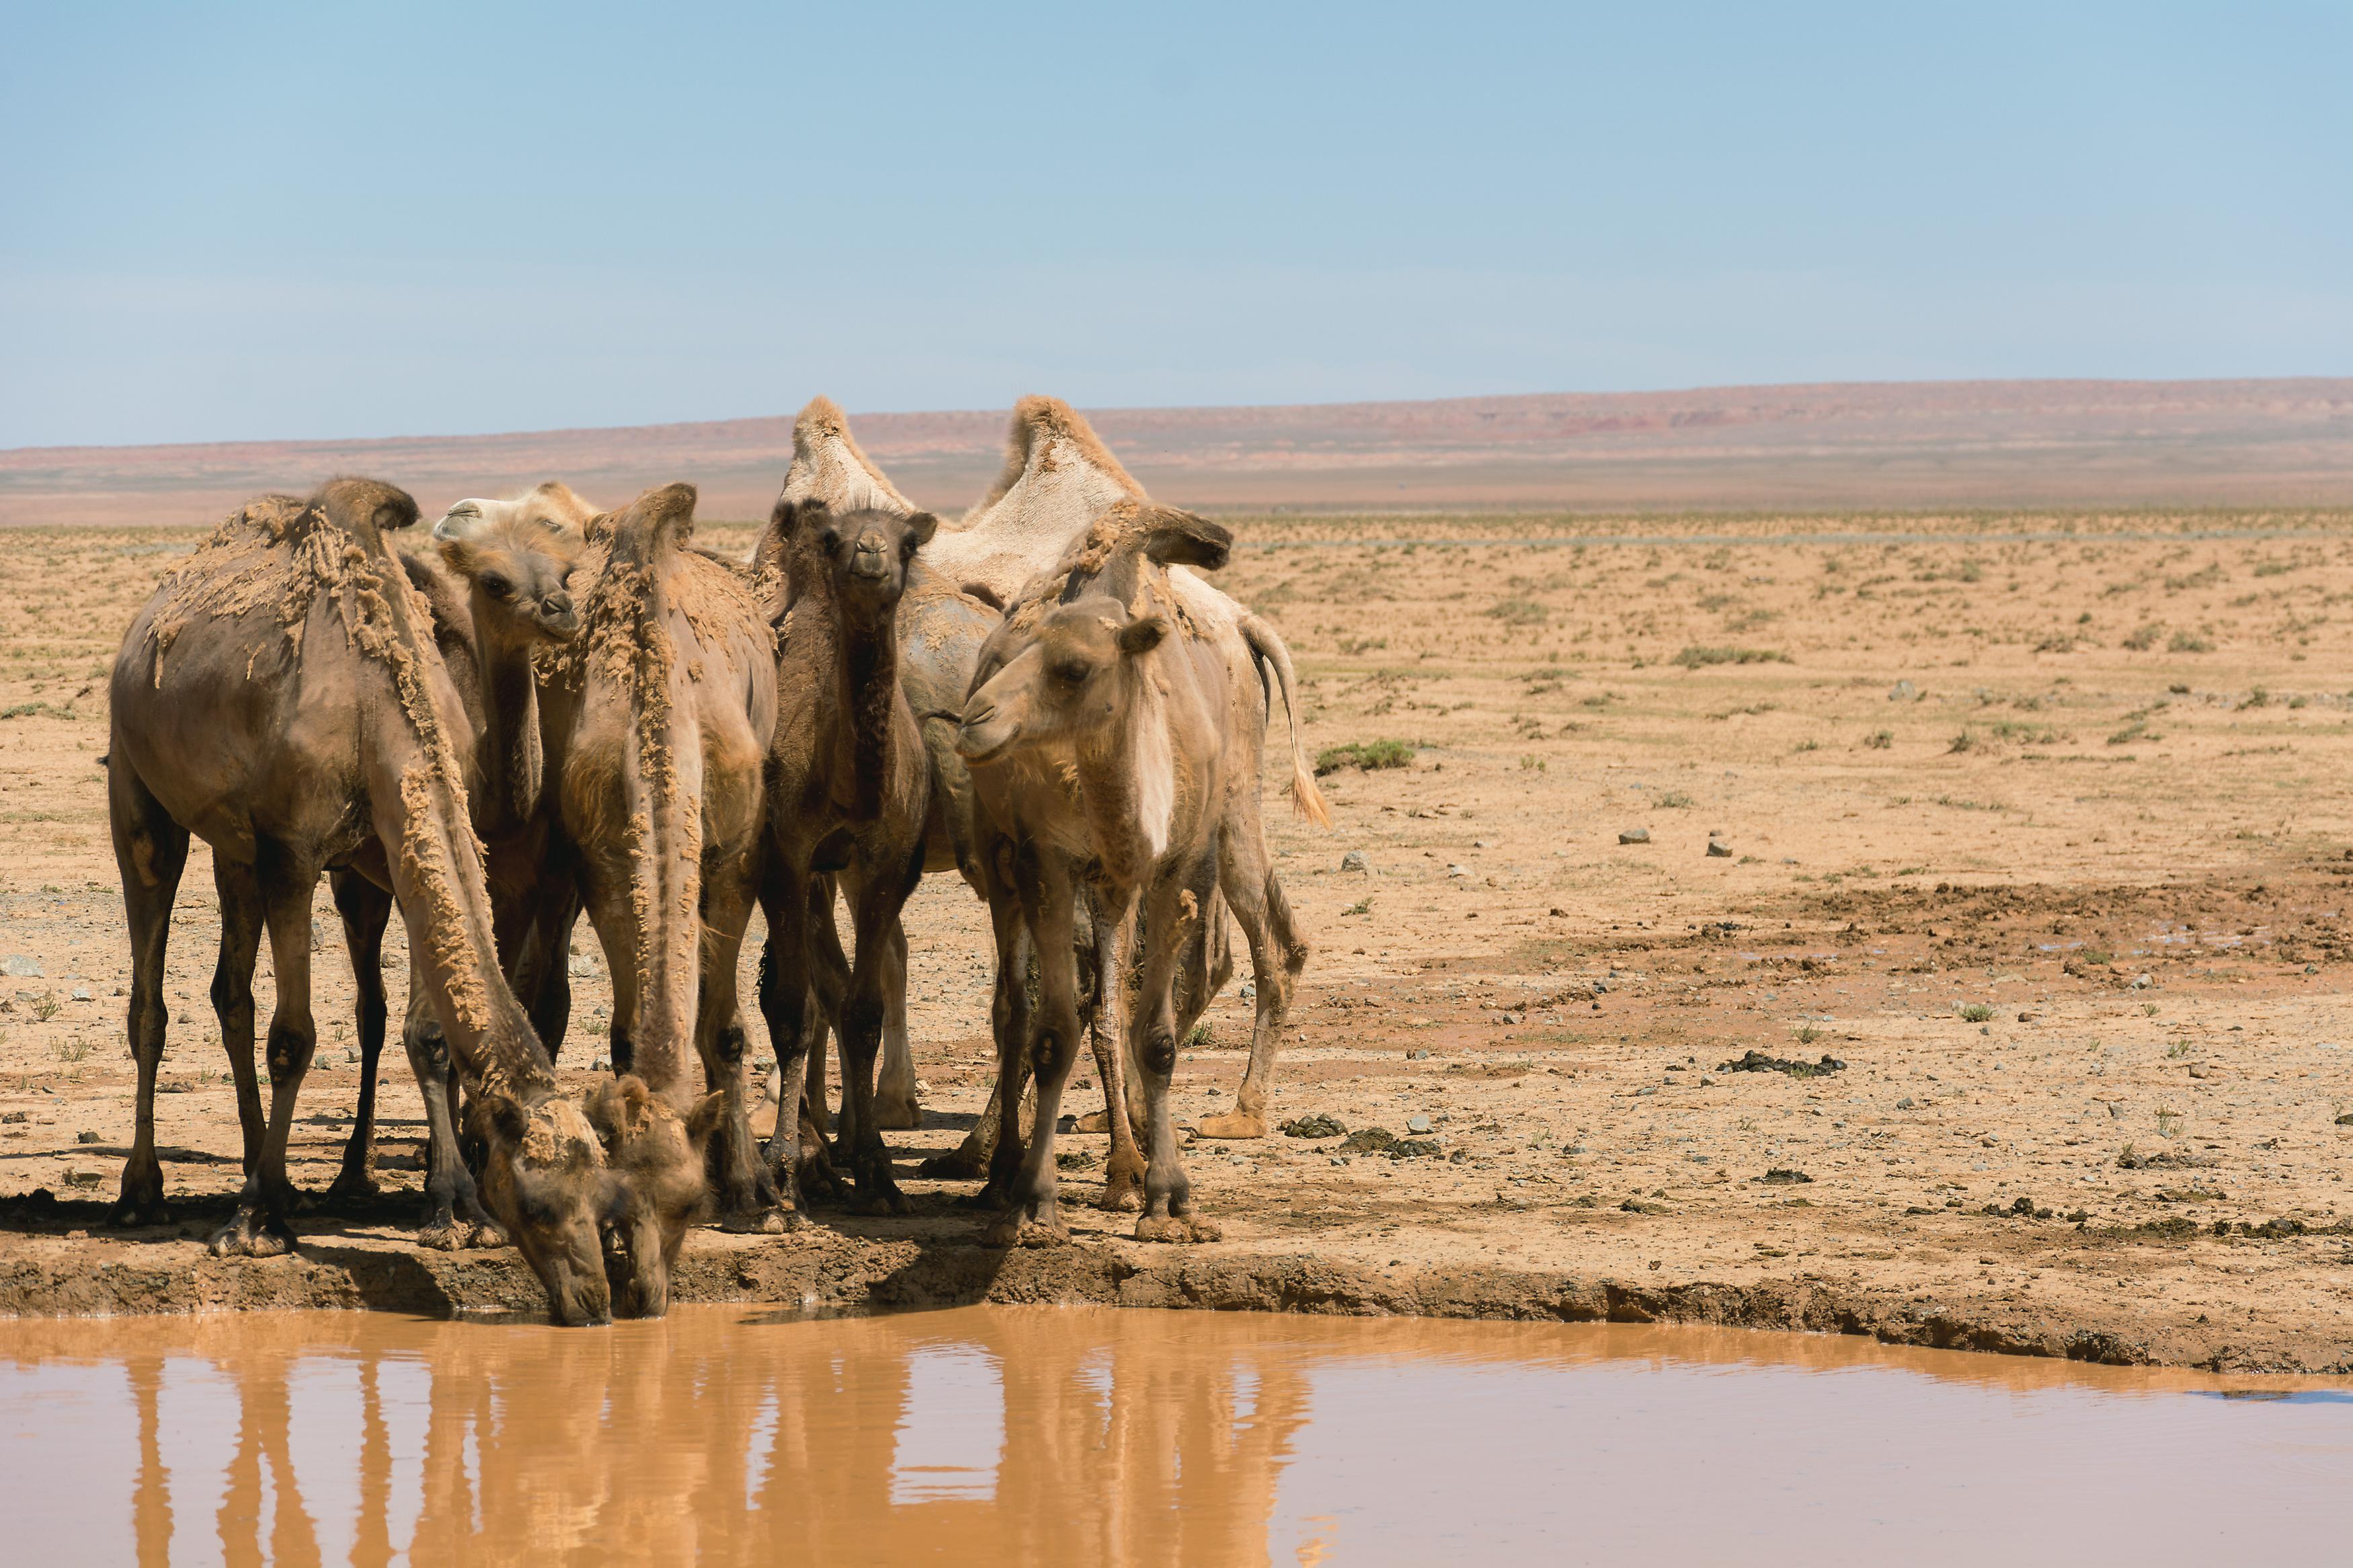 Drinking camels in desert | FREE image on LibreShot